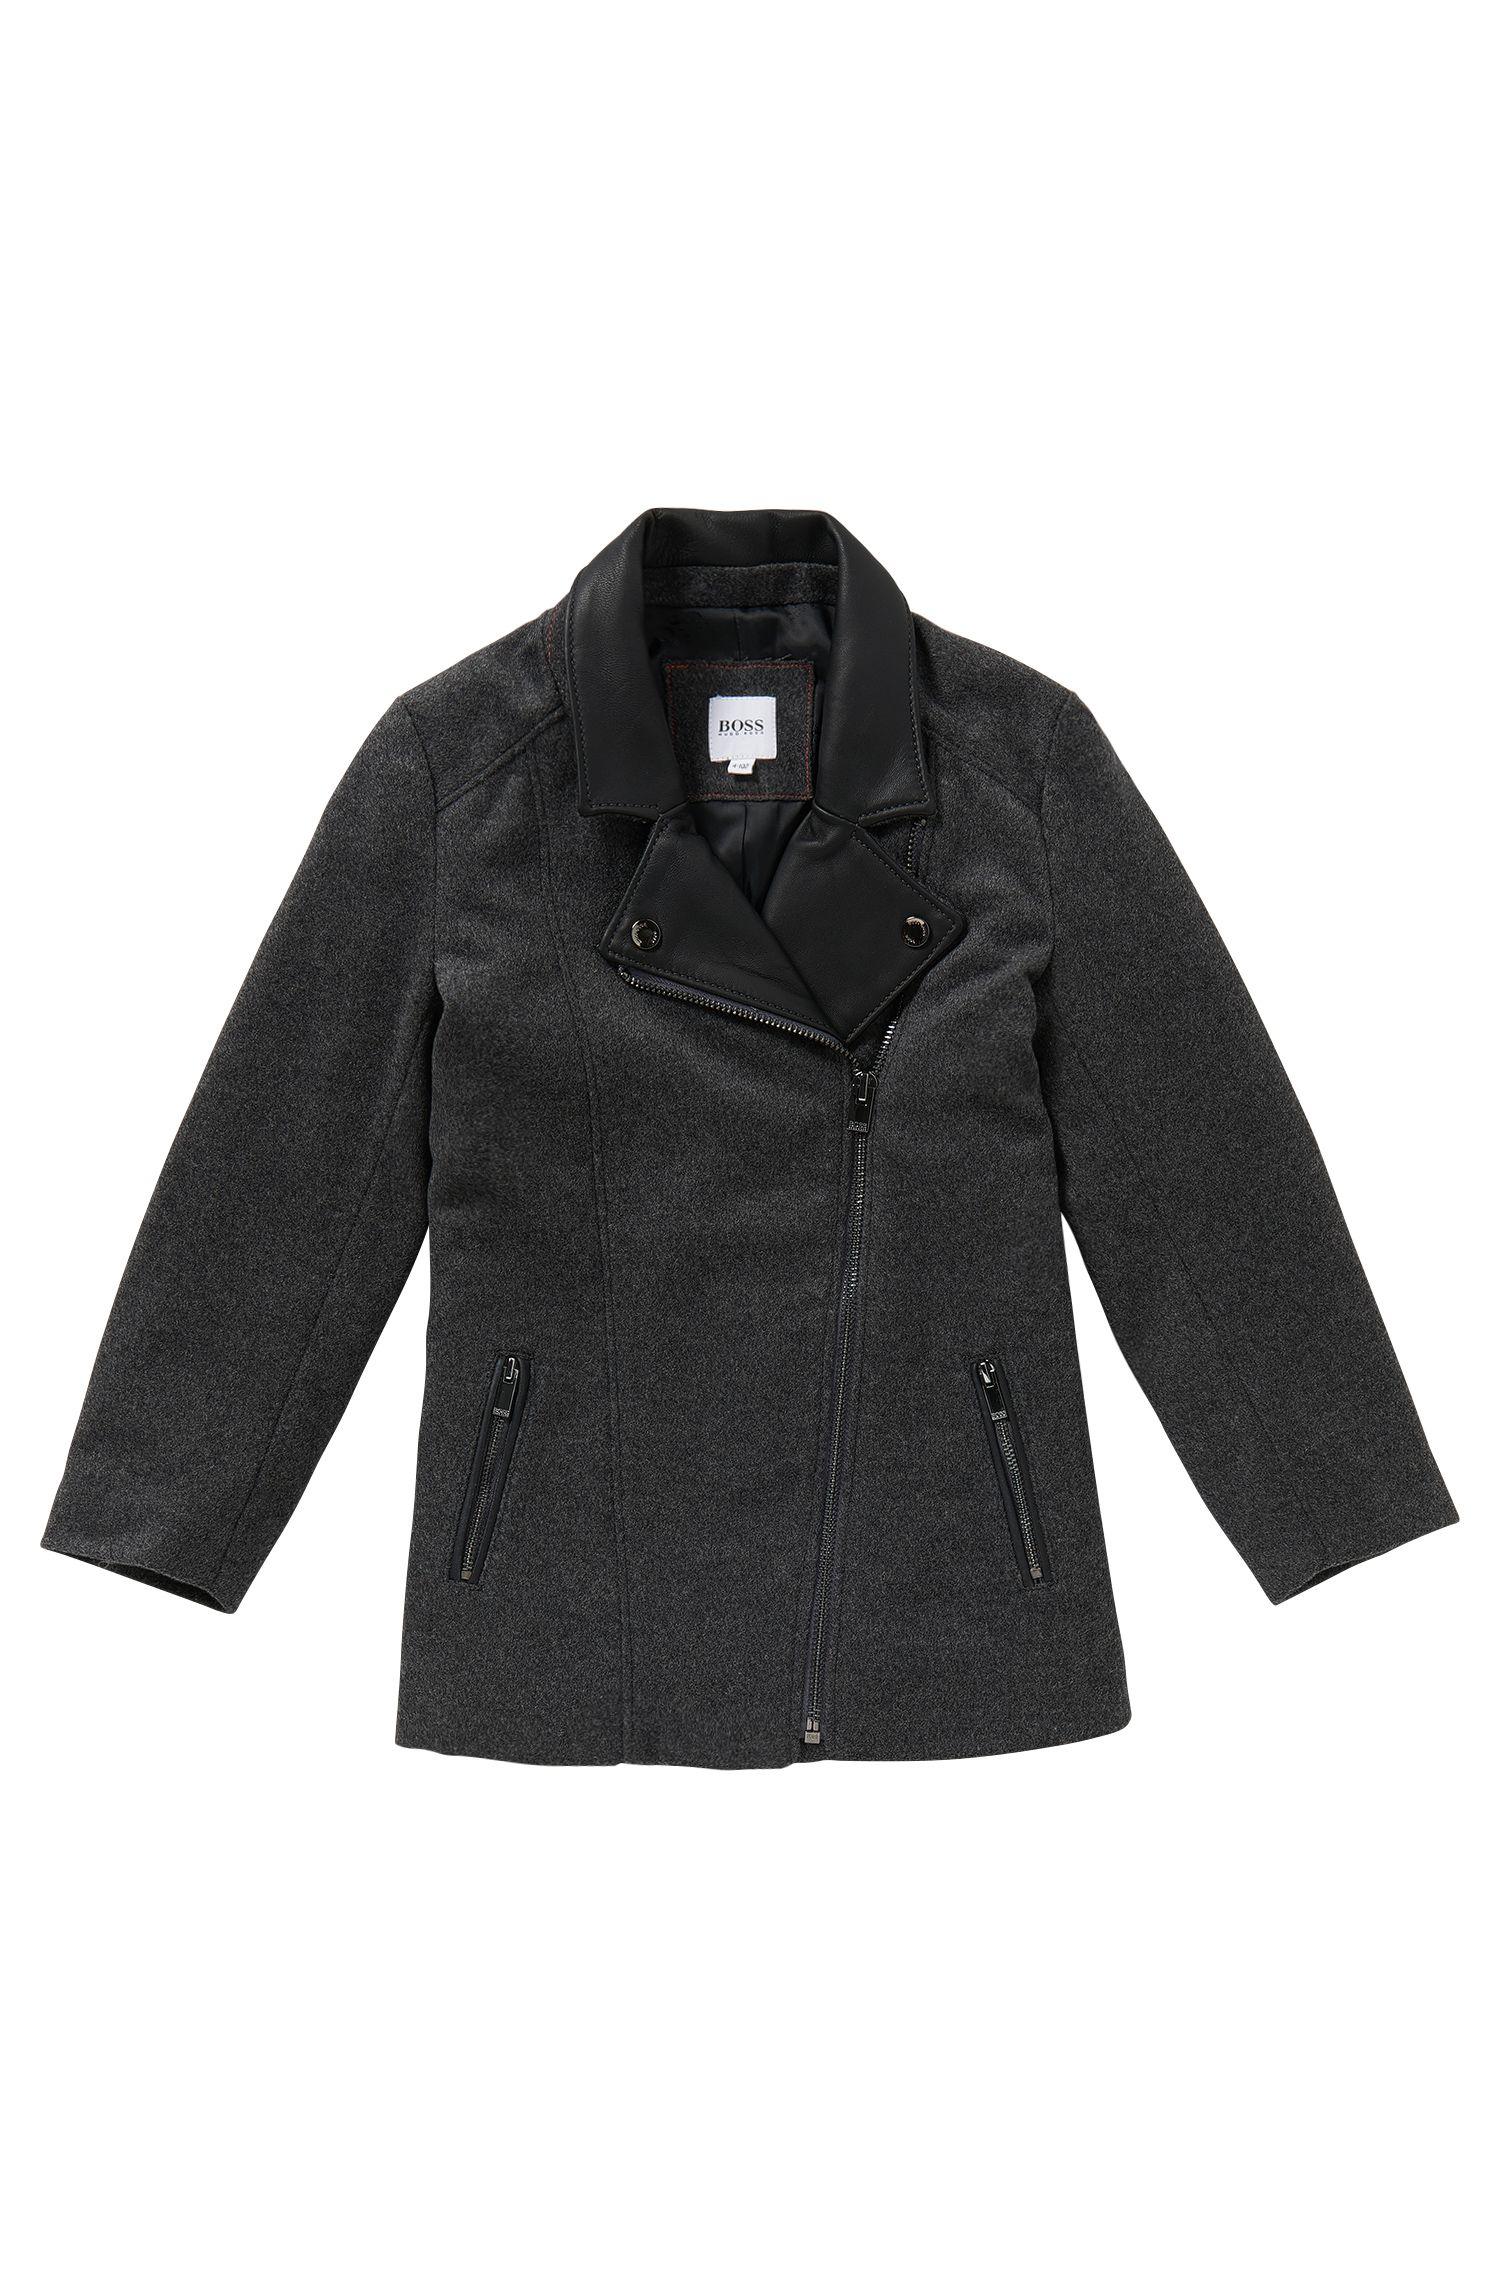 Mantel aus Woll-Mix mit Leder-Besatz: 'J16111'